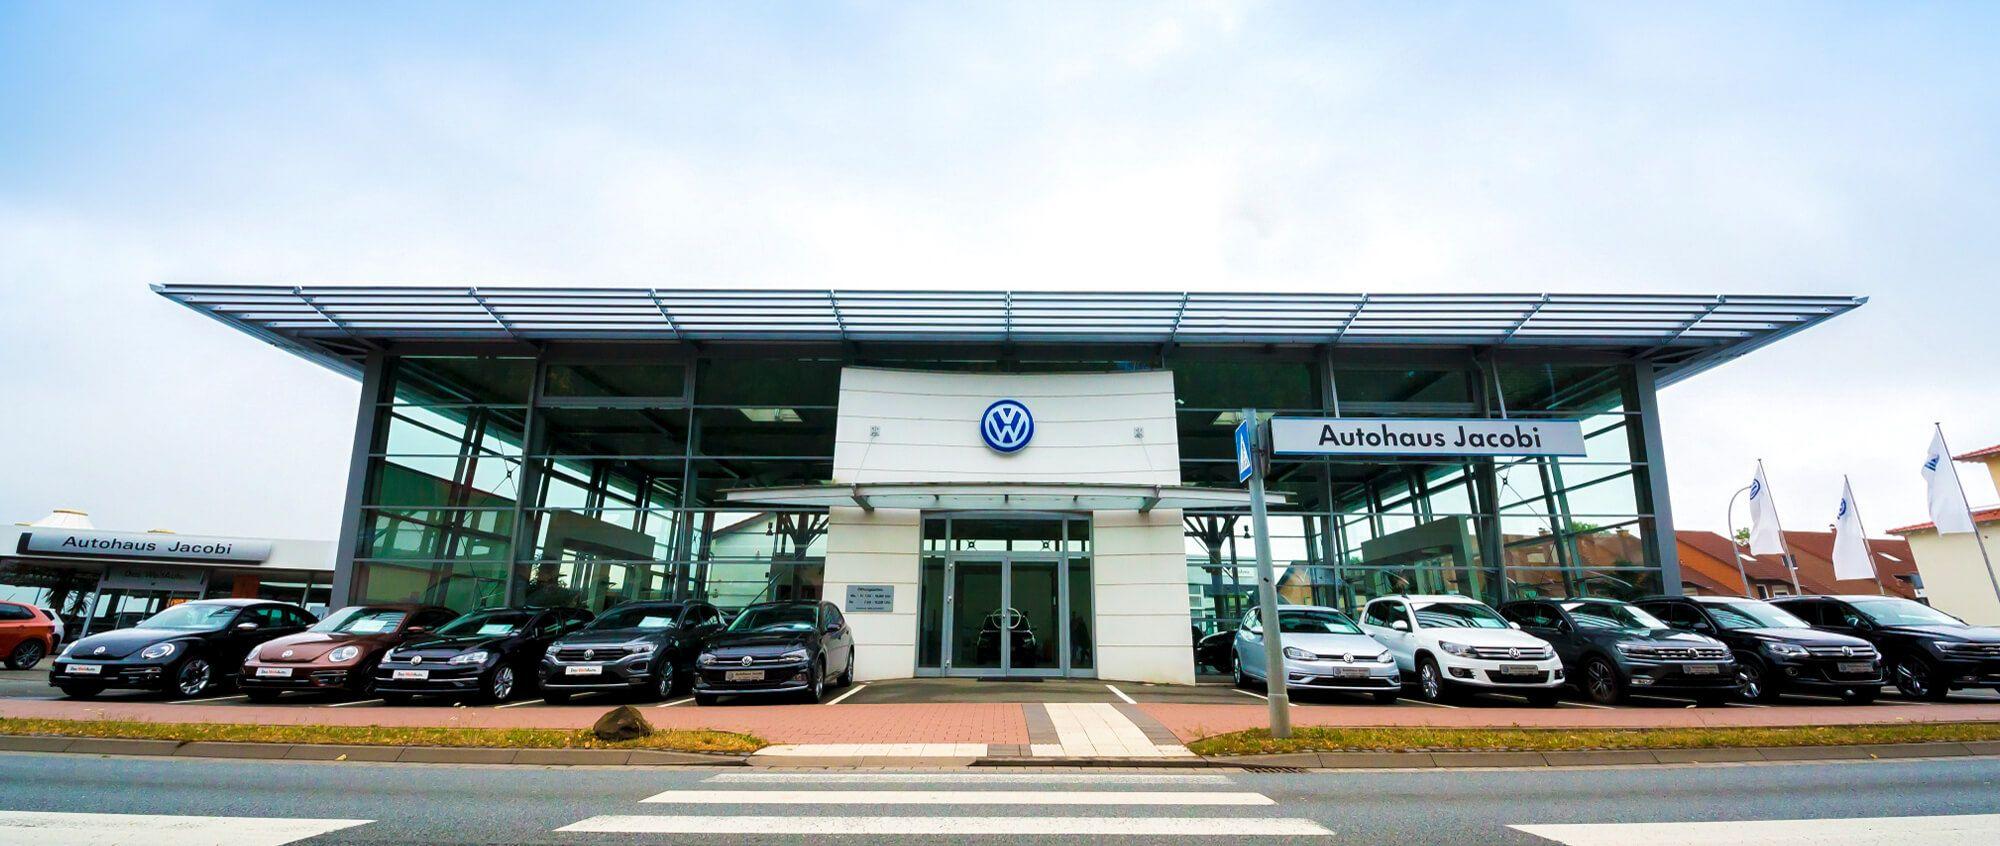 Autohaus Jacobi GmbH & Co.KG